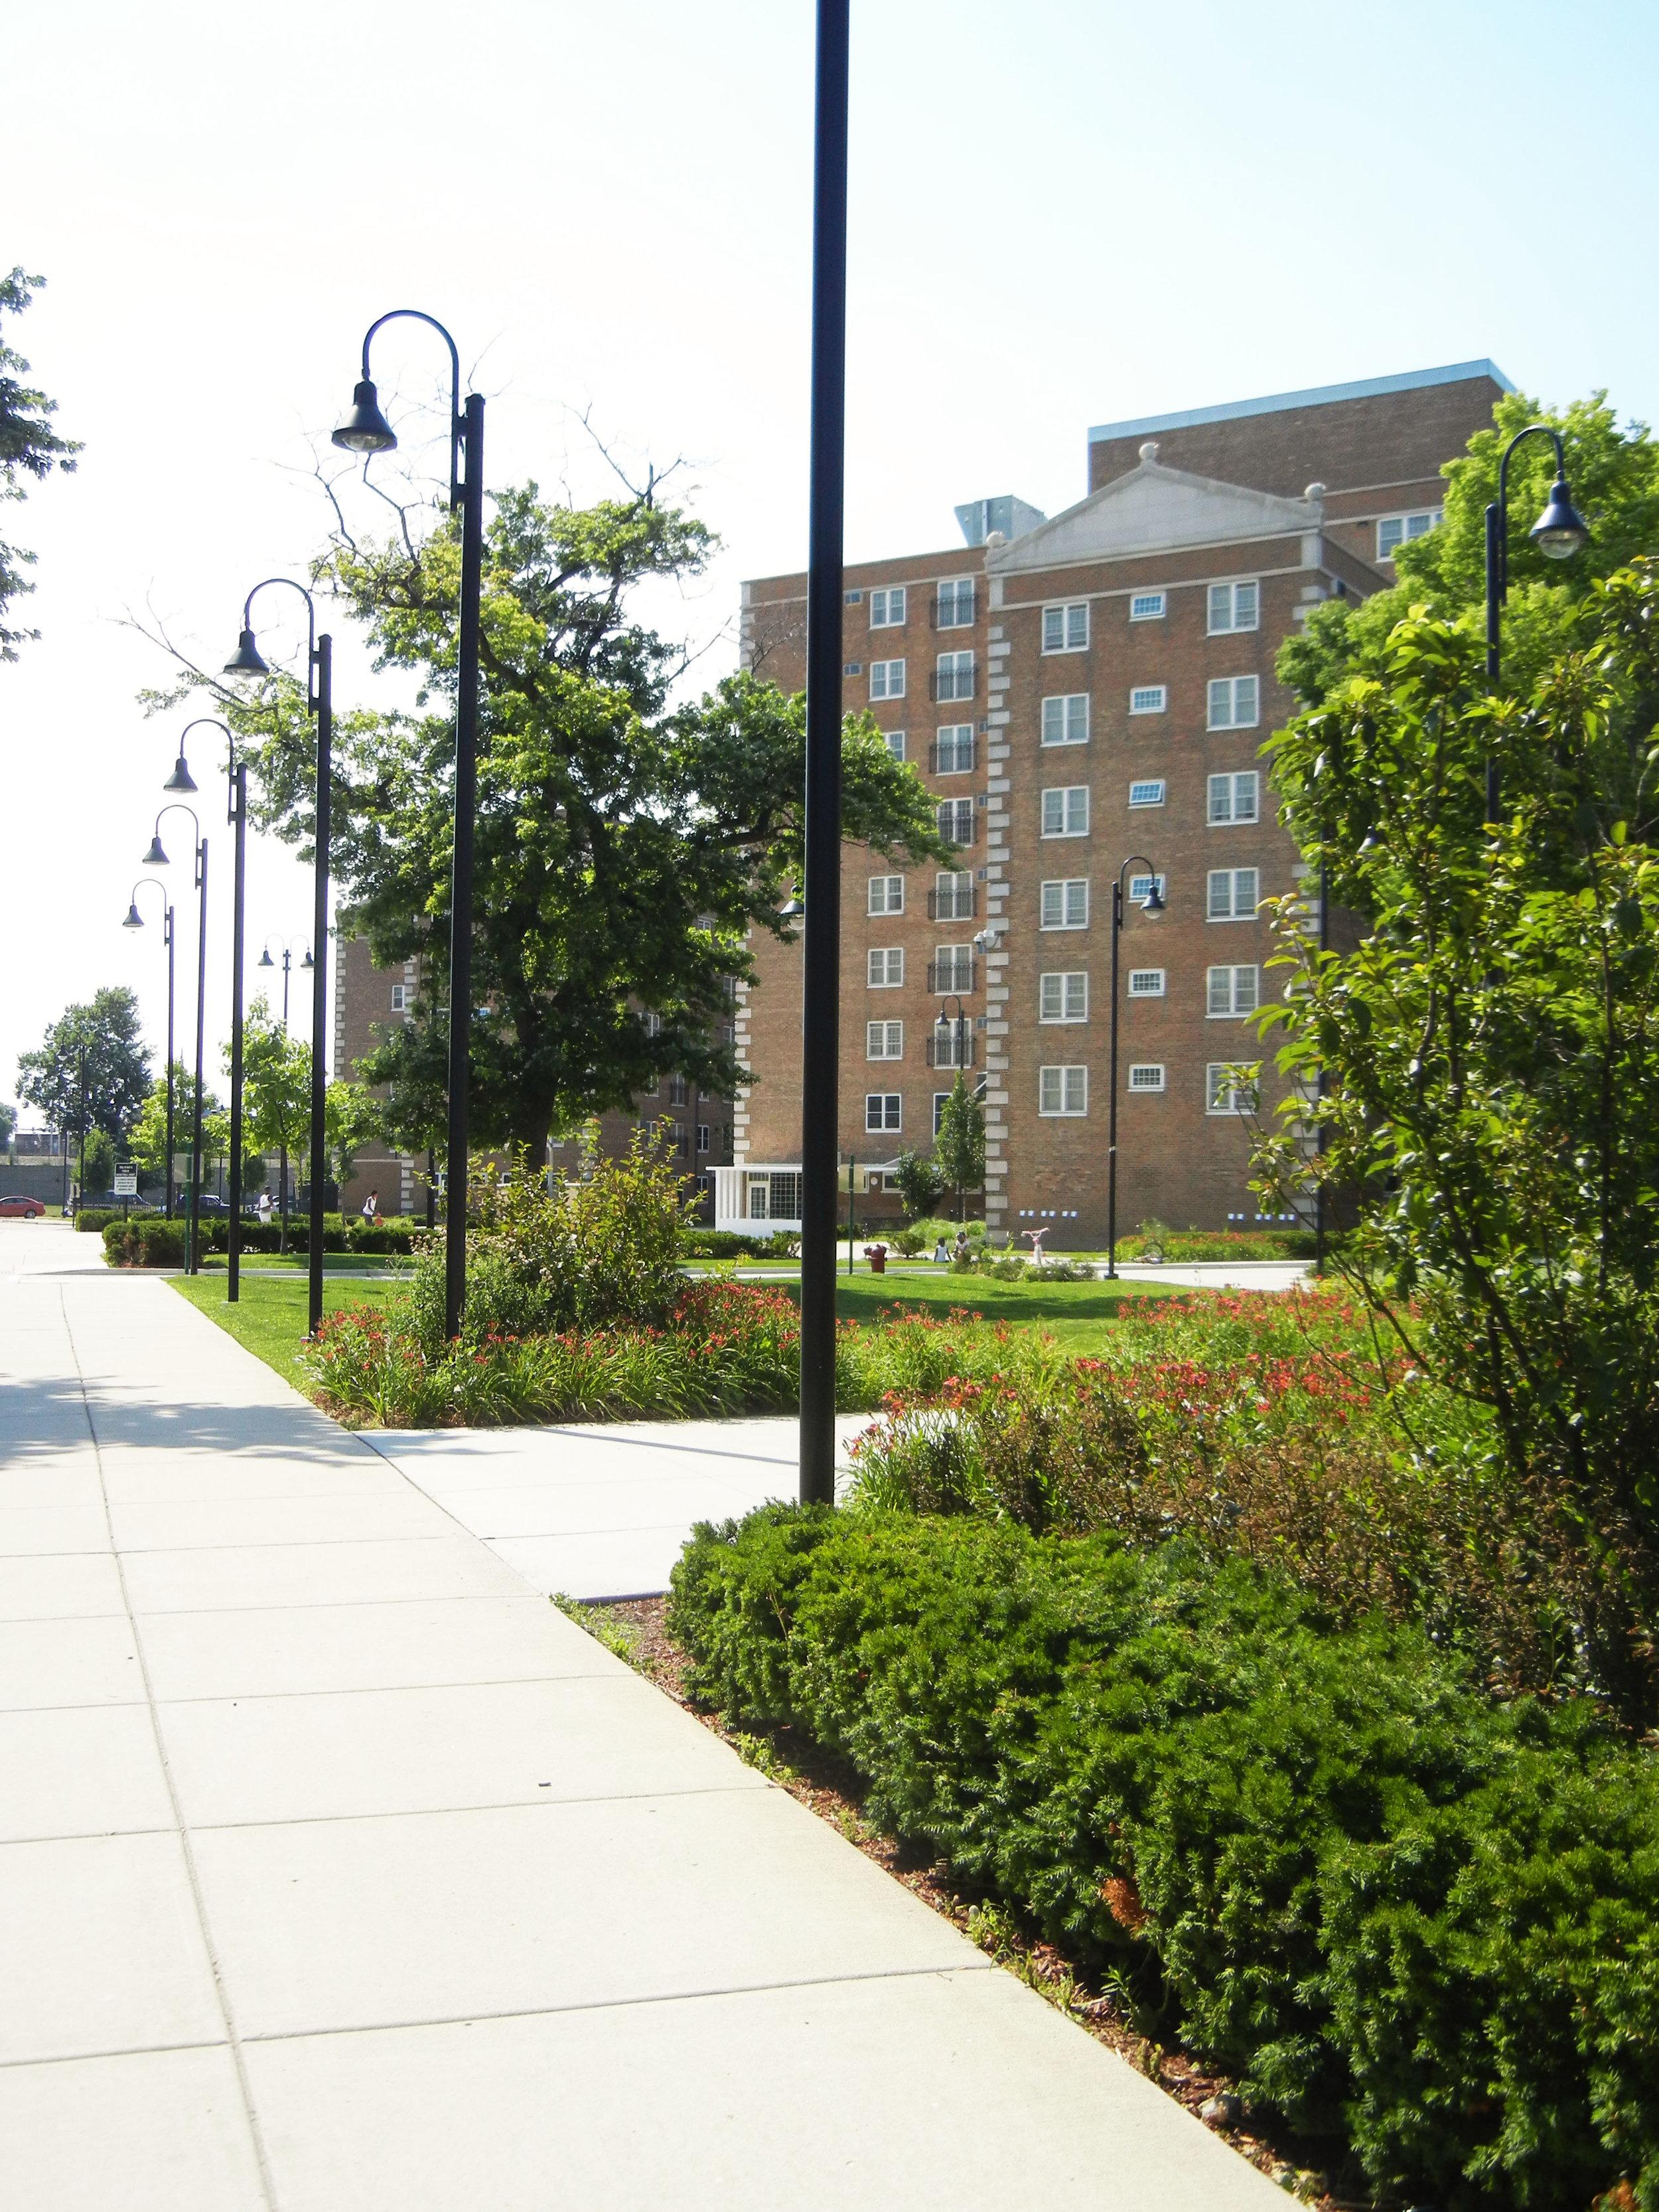 Landscaped Pathway.JPG